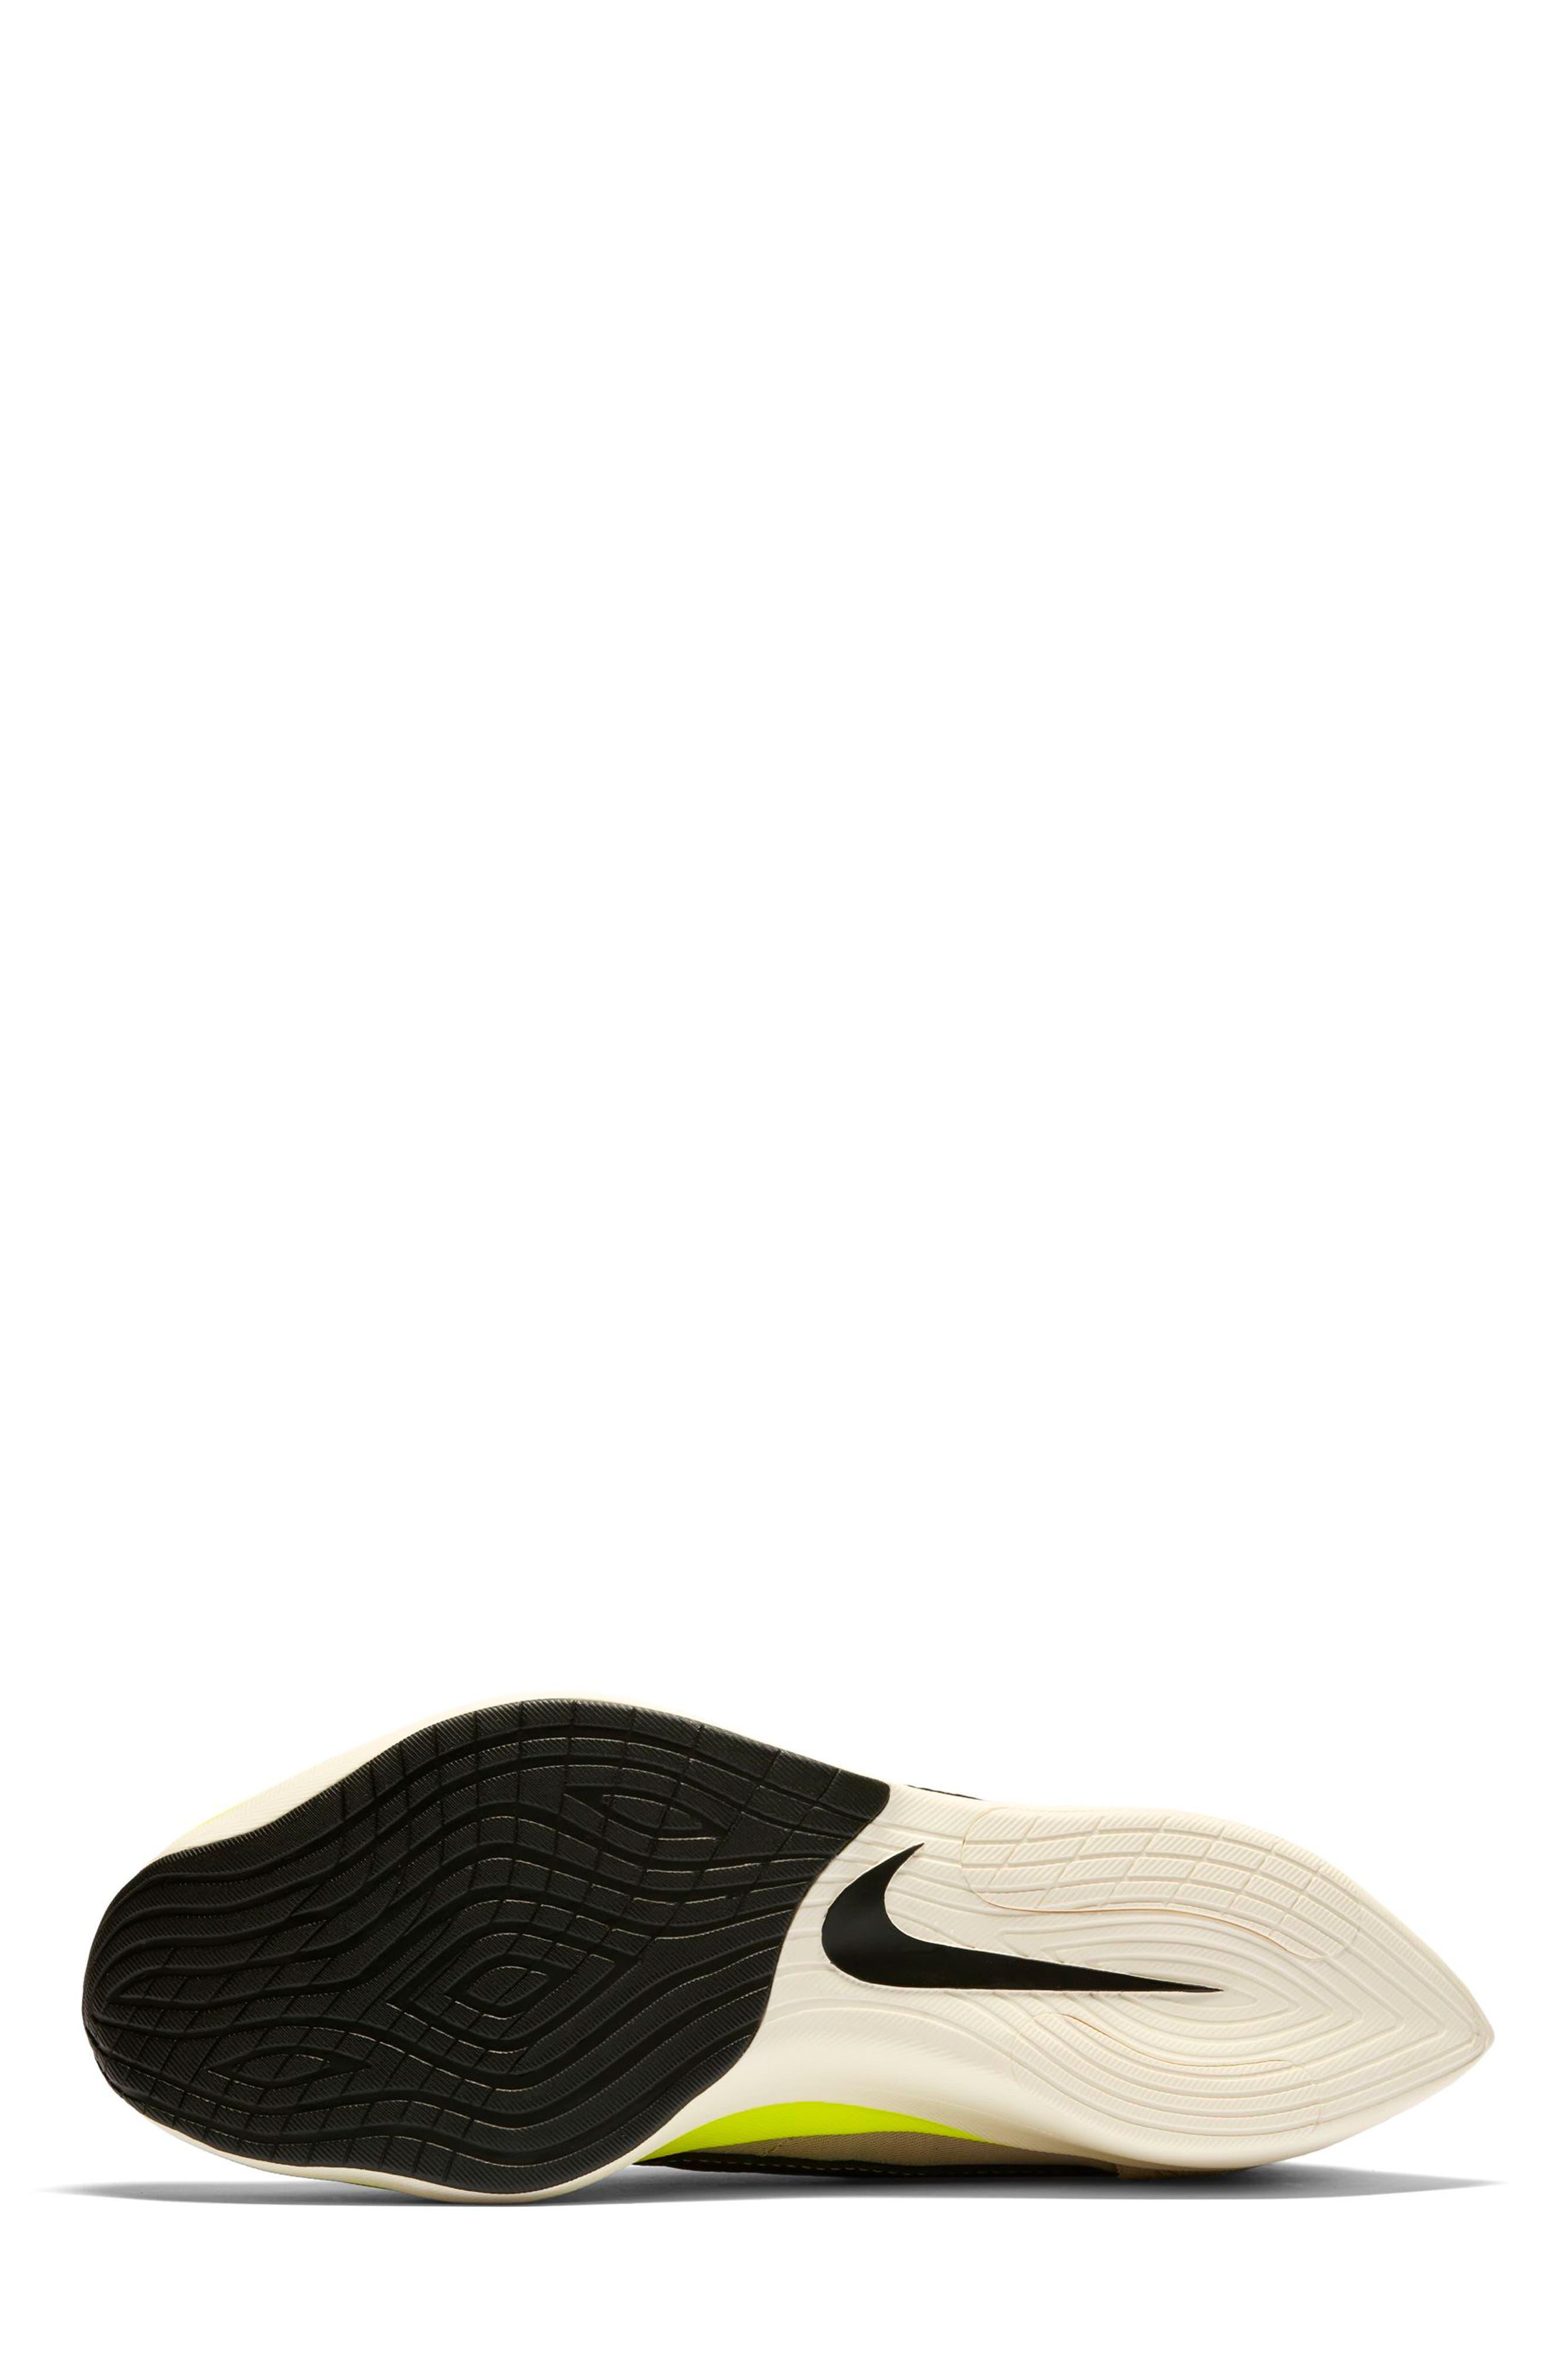 Moon Racer Sneaker,                             Alternate thumbnail 5, color,                             STRING/ BLACK/ SAIL/ VOLT